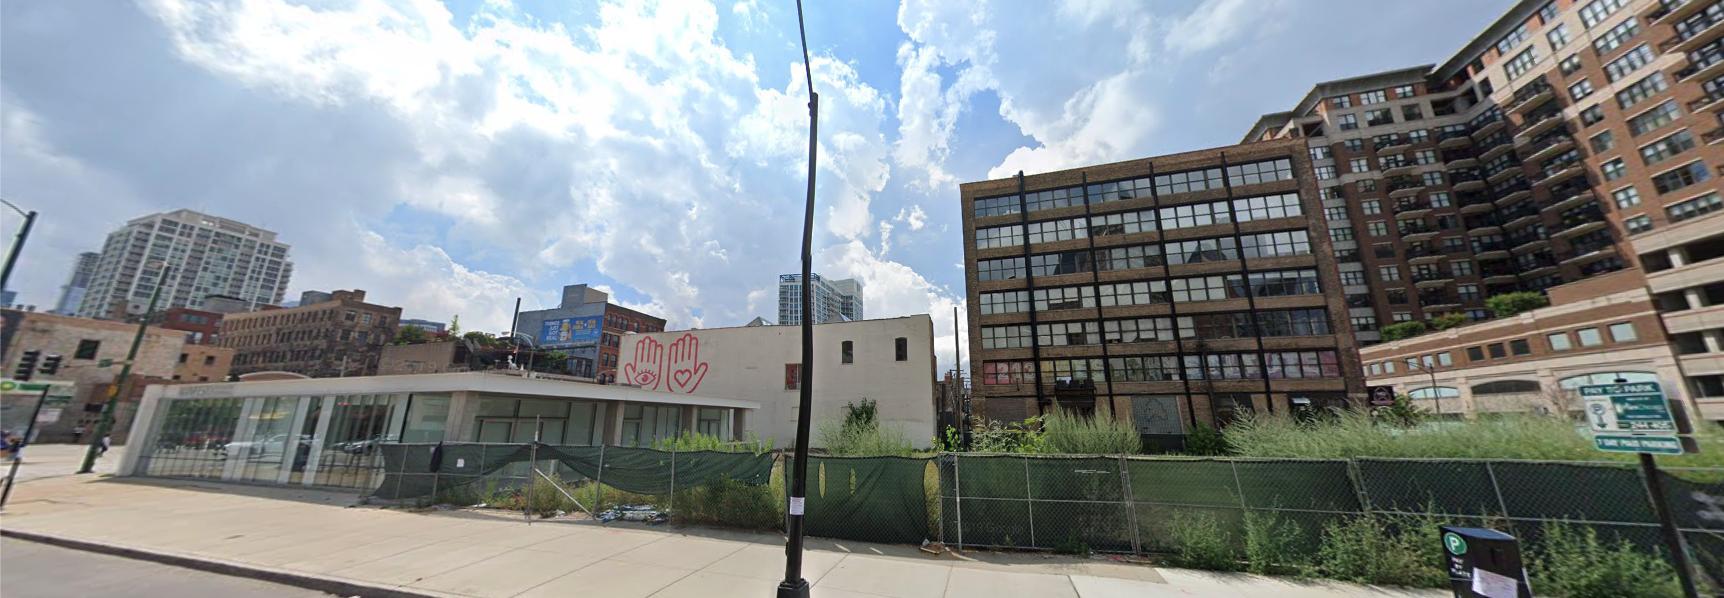 808 N Wells Street via Google Maps